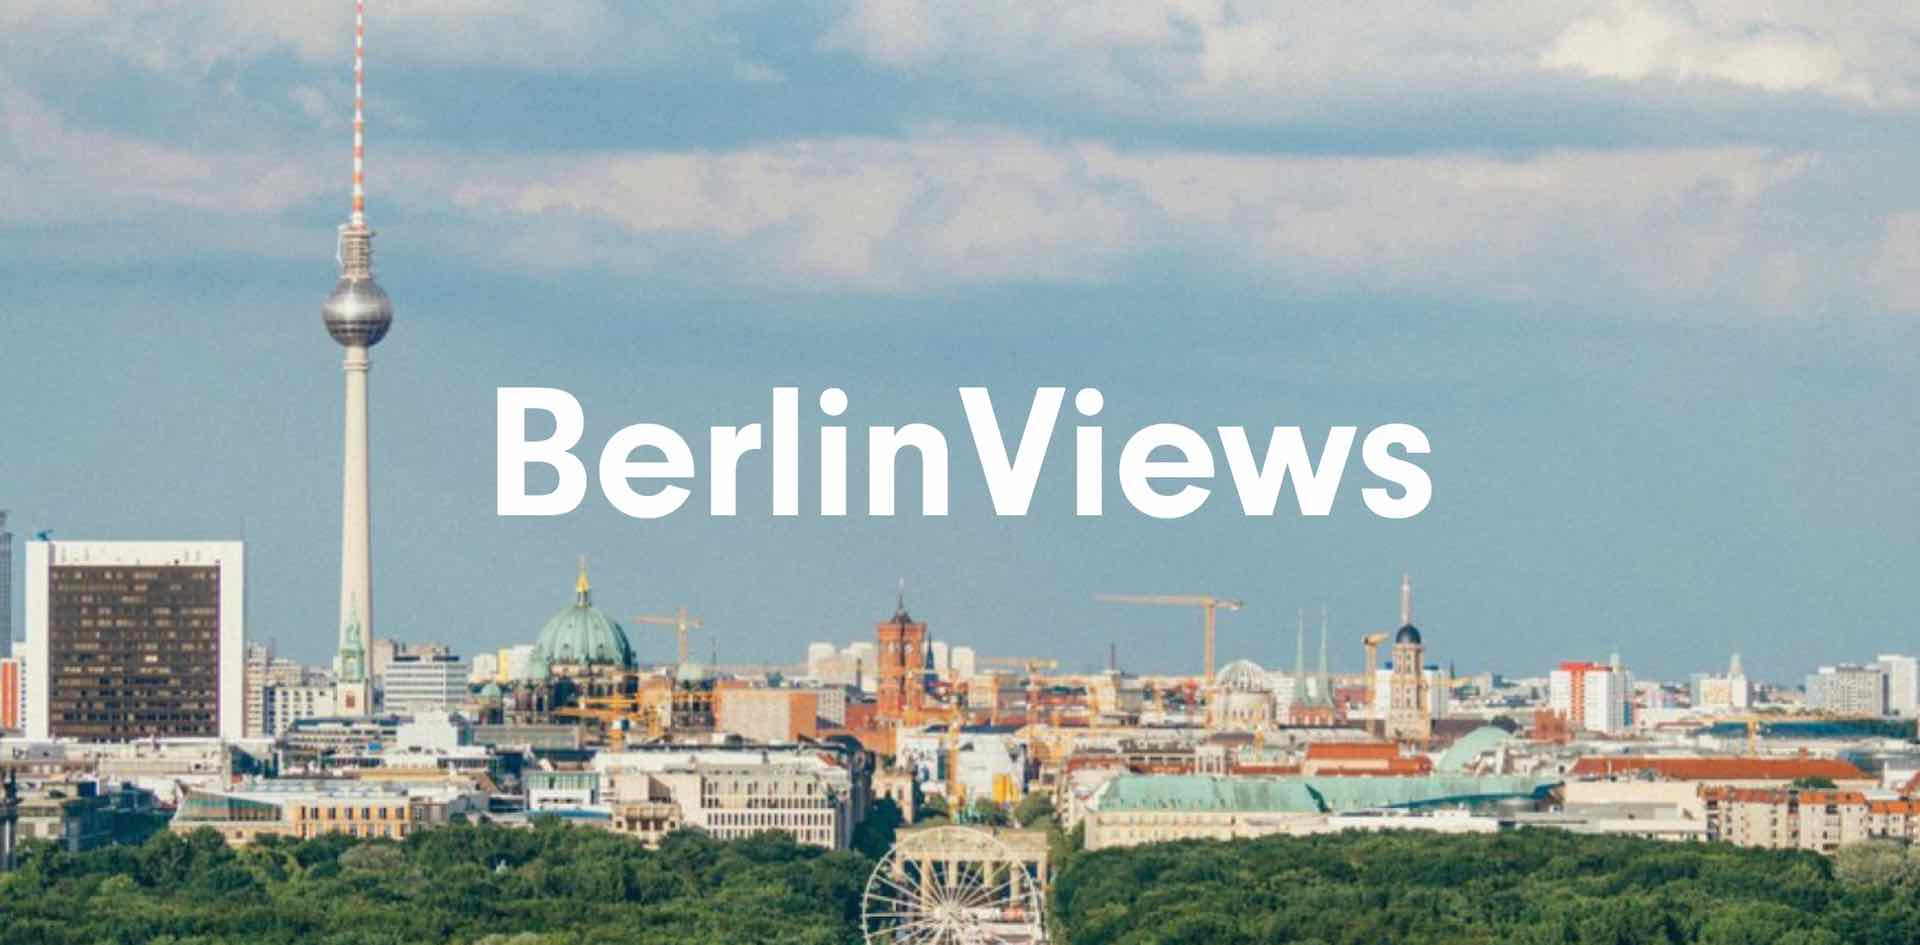 berlinviews